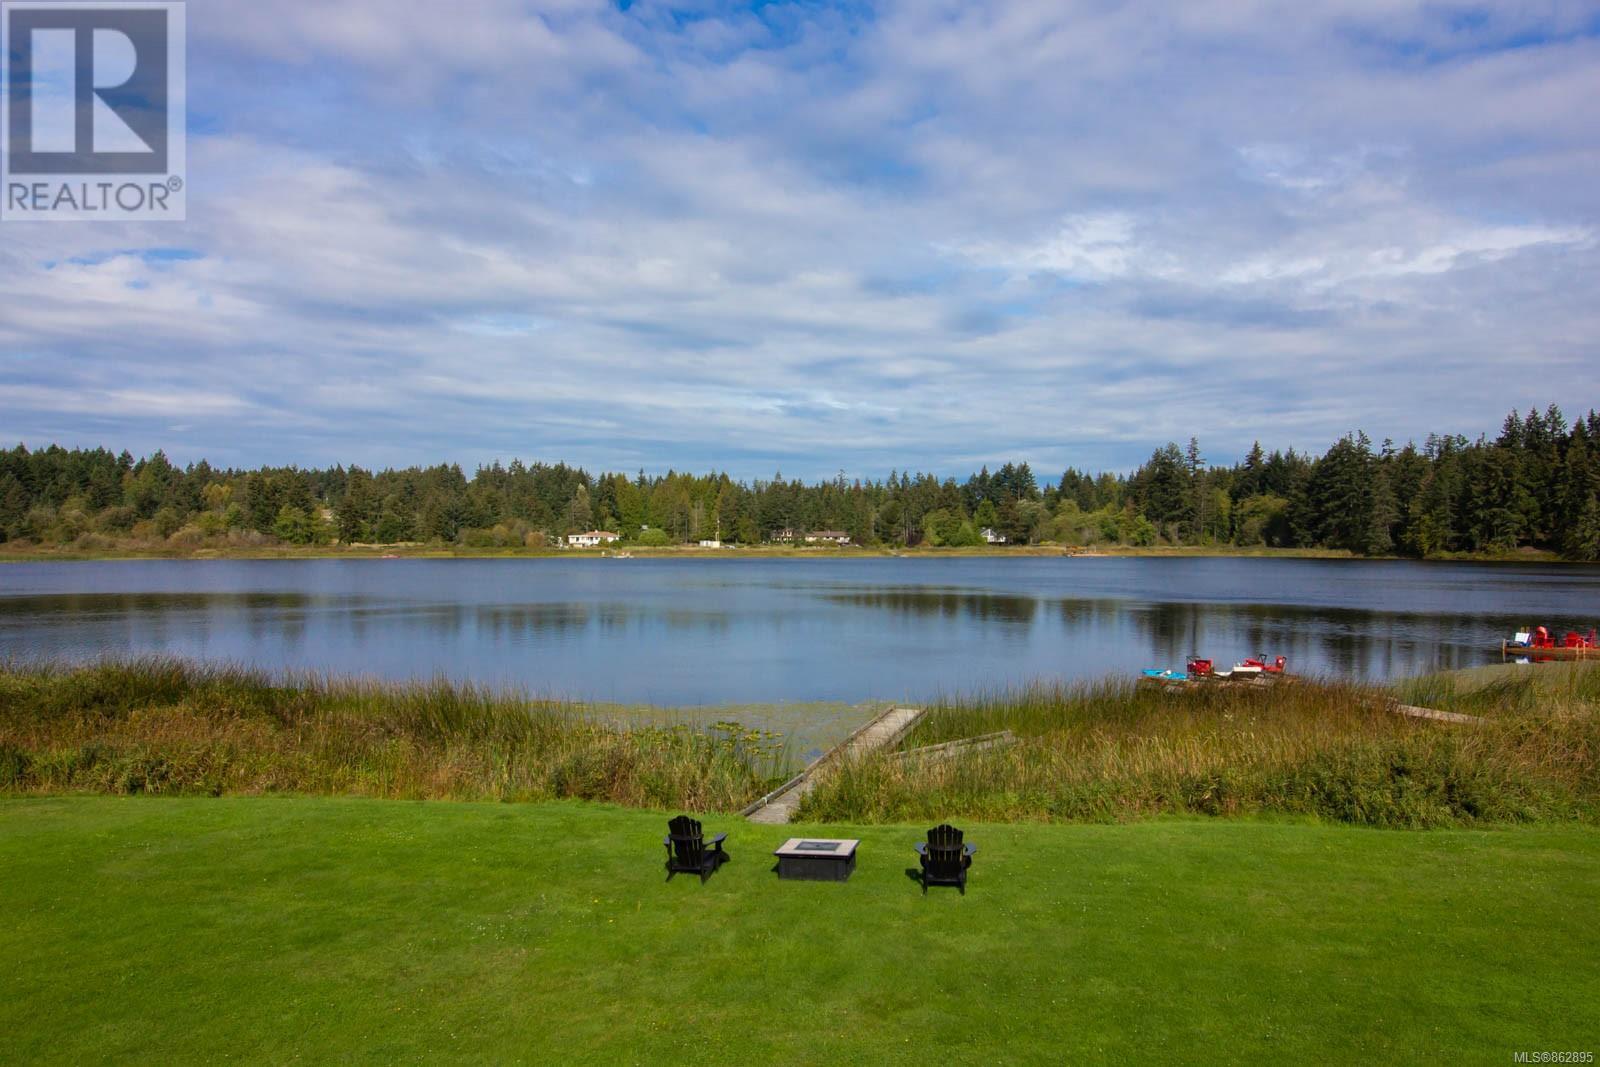 6690 Jenkins Rd, Nanaimo, British Columbia  V9T 6G8 - Photo 29 - 862895